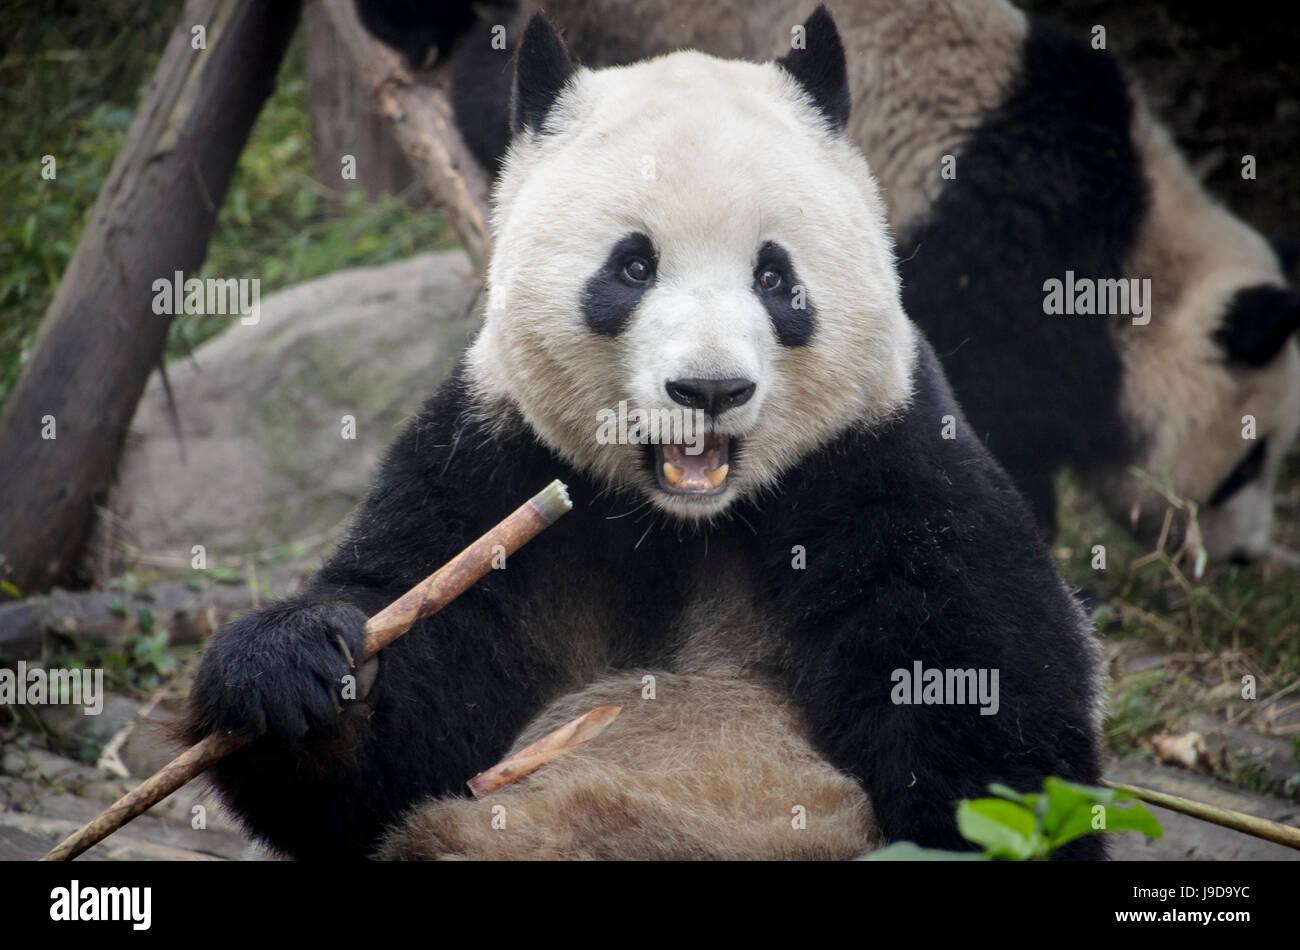 Chengdu Research Base of Giant Panda Breeding, Chengdu, Sichuan Province, China, Asia - Stock Image